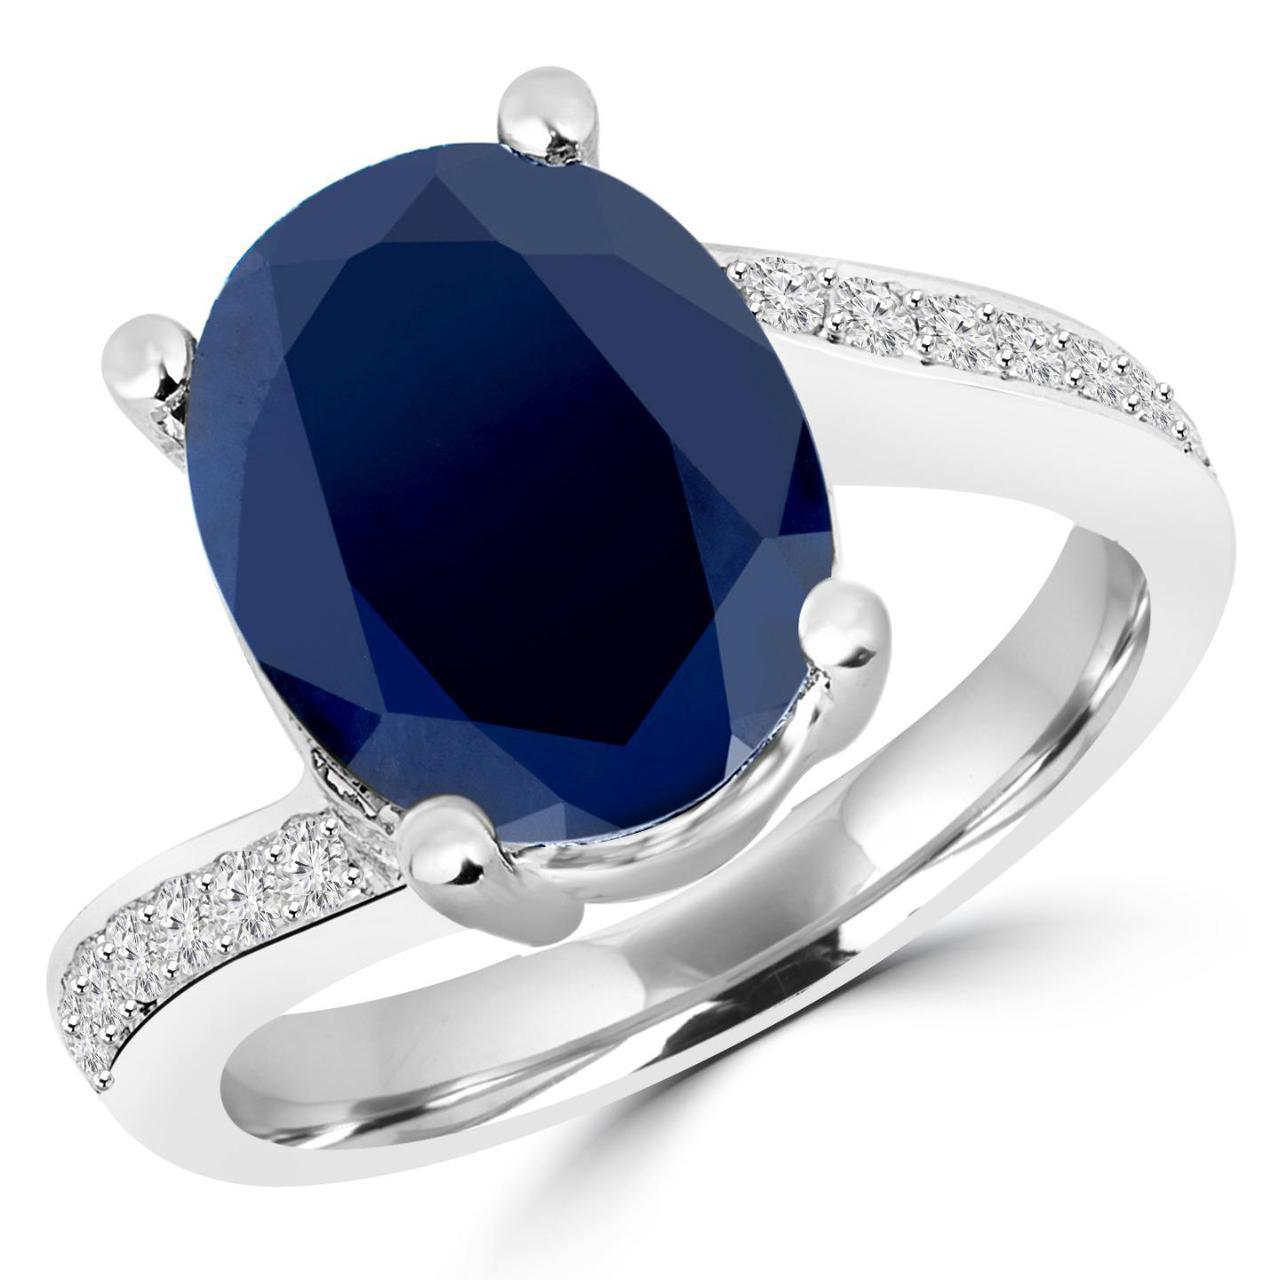 Oval Sapphire Ring | Bijoux Majesty